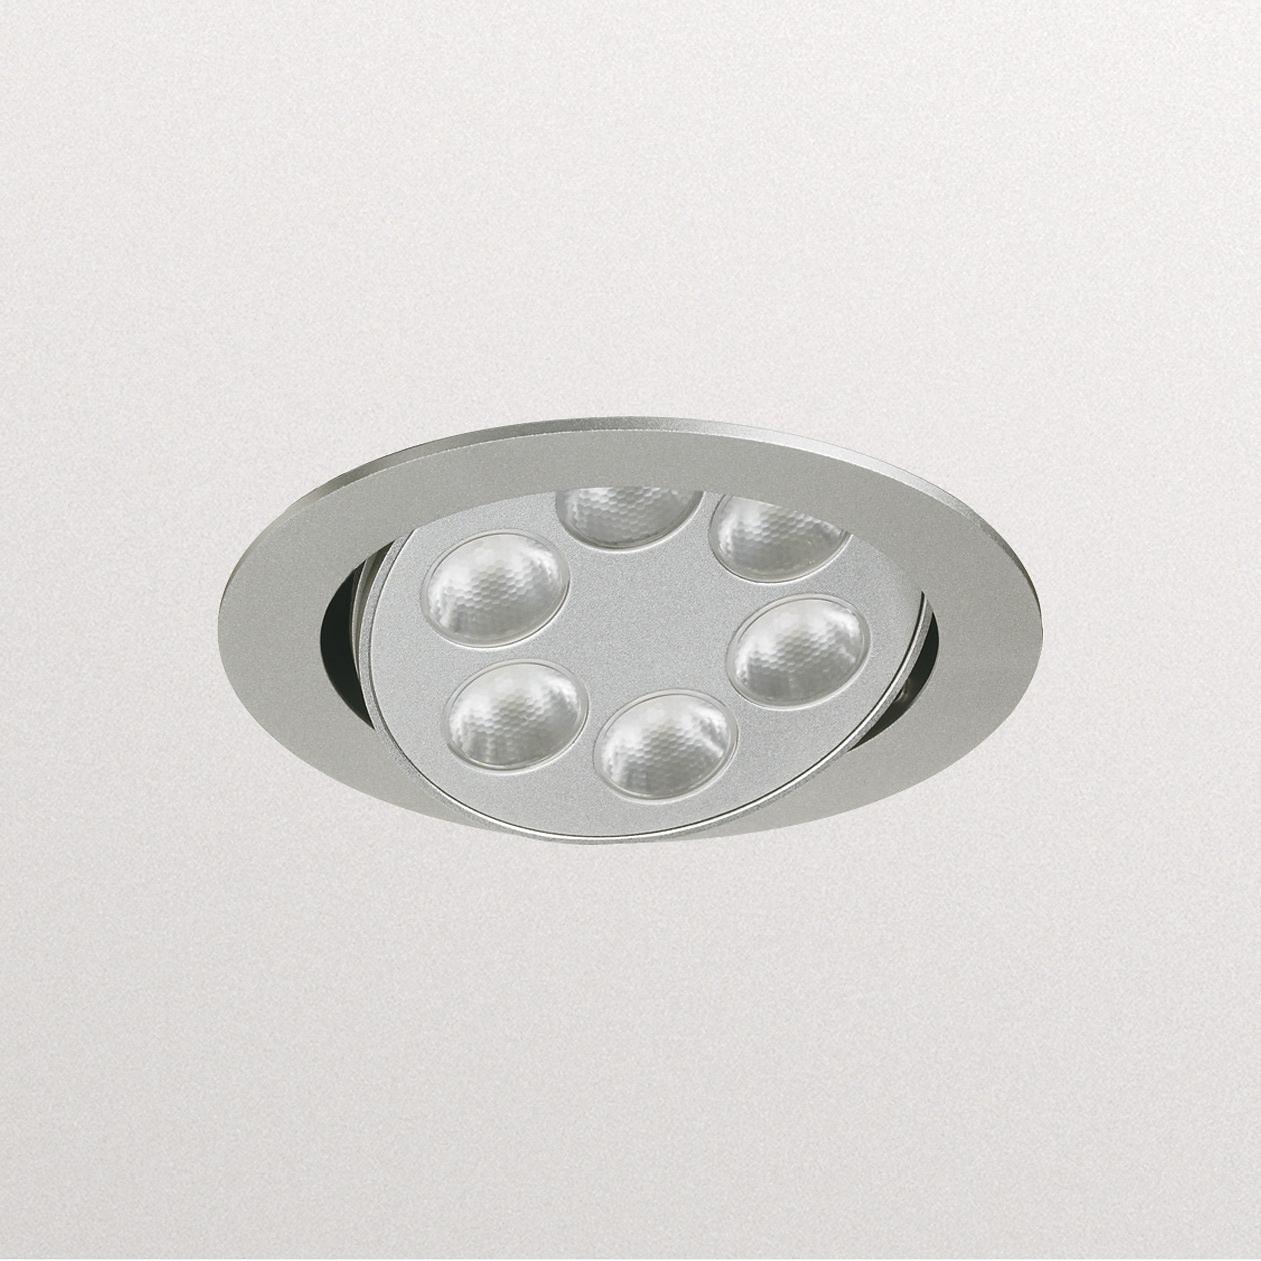 philips 896325 luminaire encastr accentuation. Black Bedroom Furniture Sets. Home Design Ideas